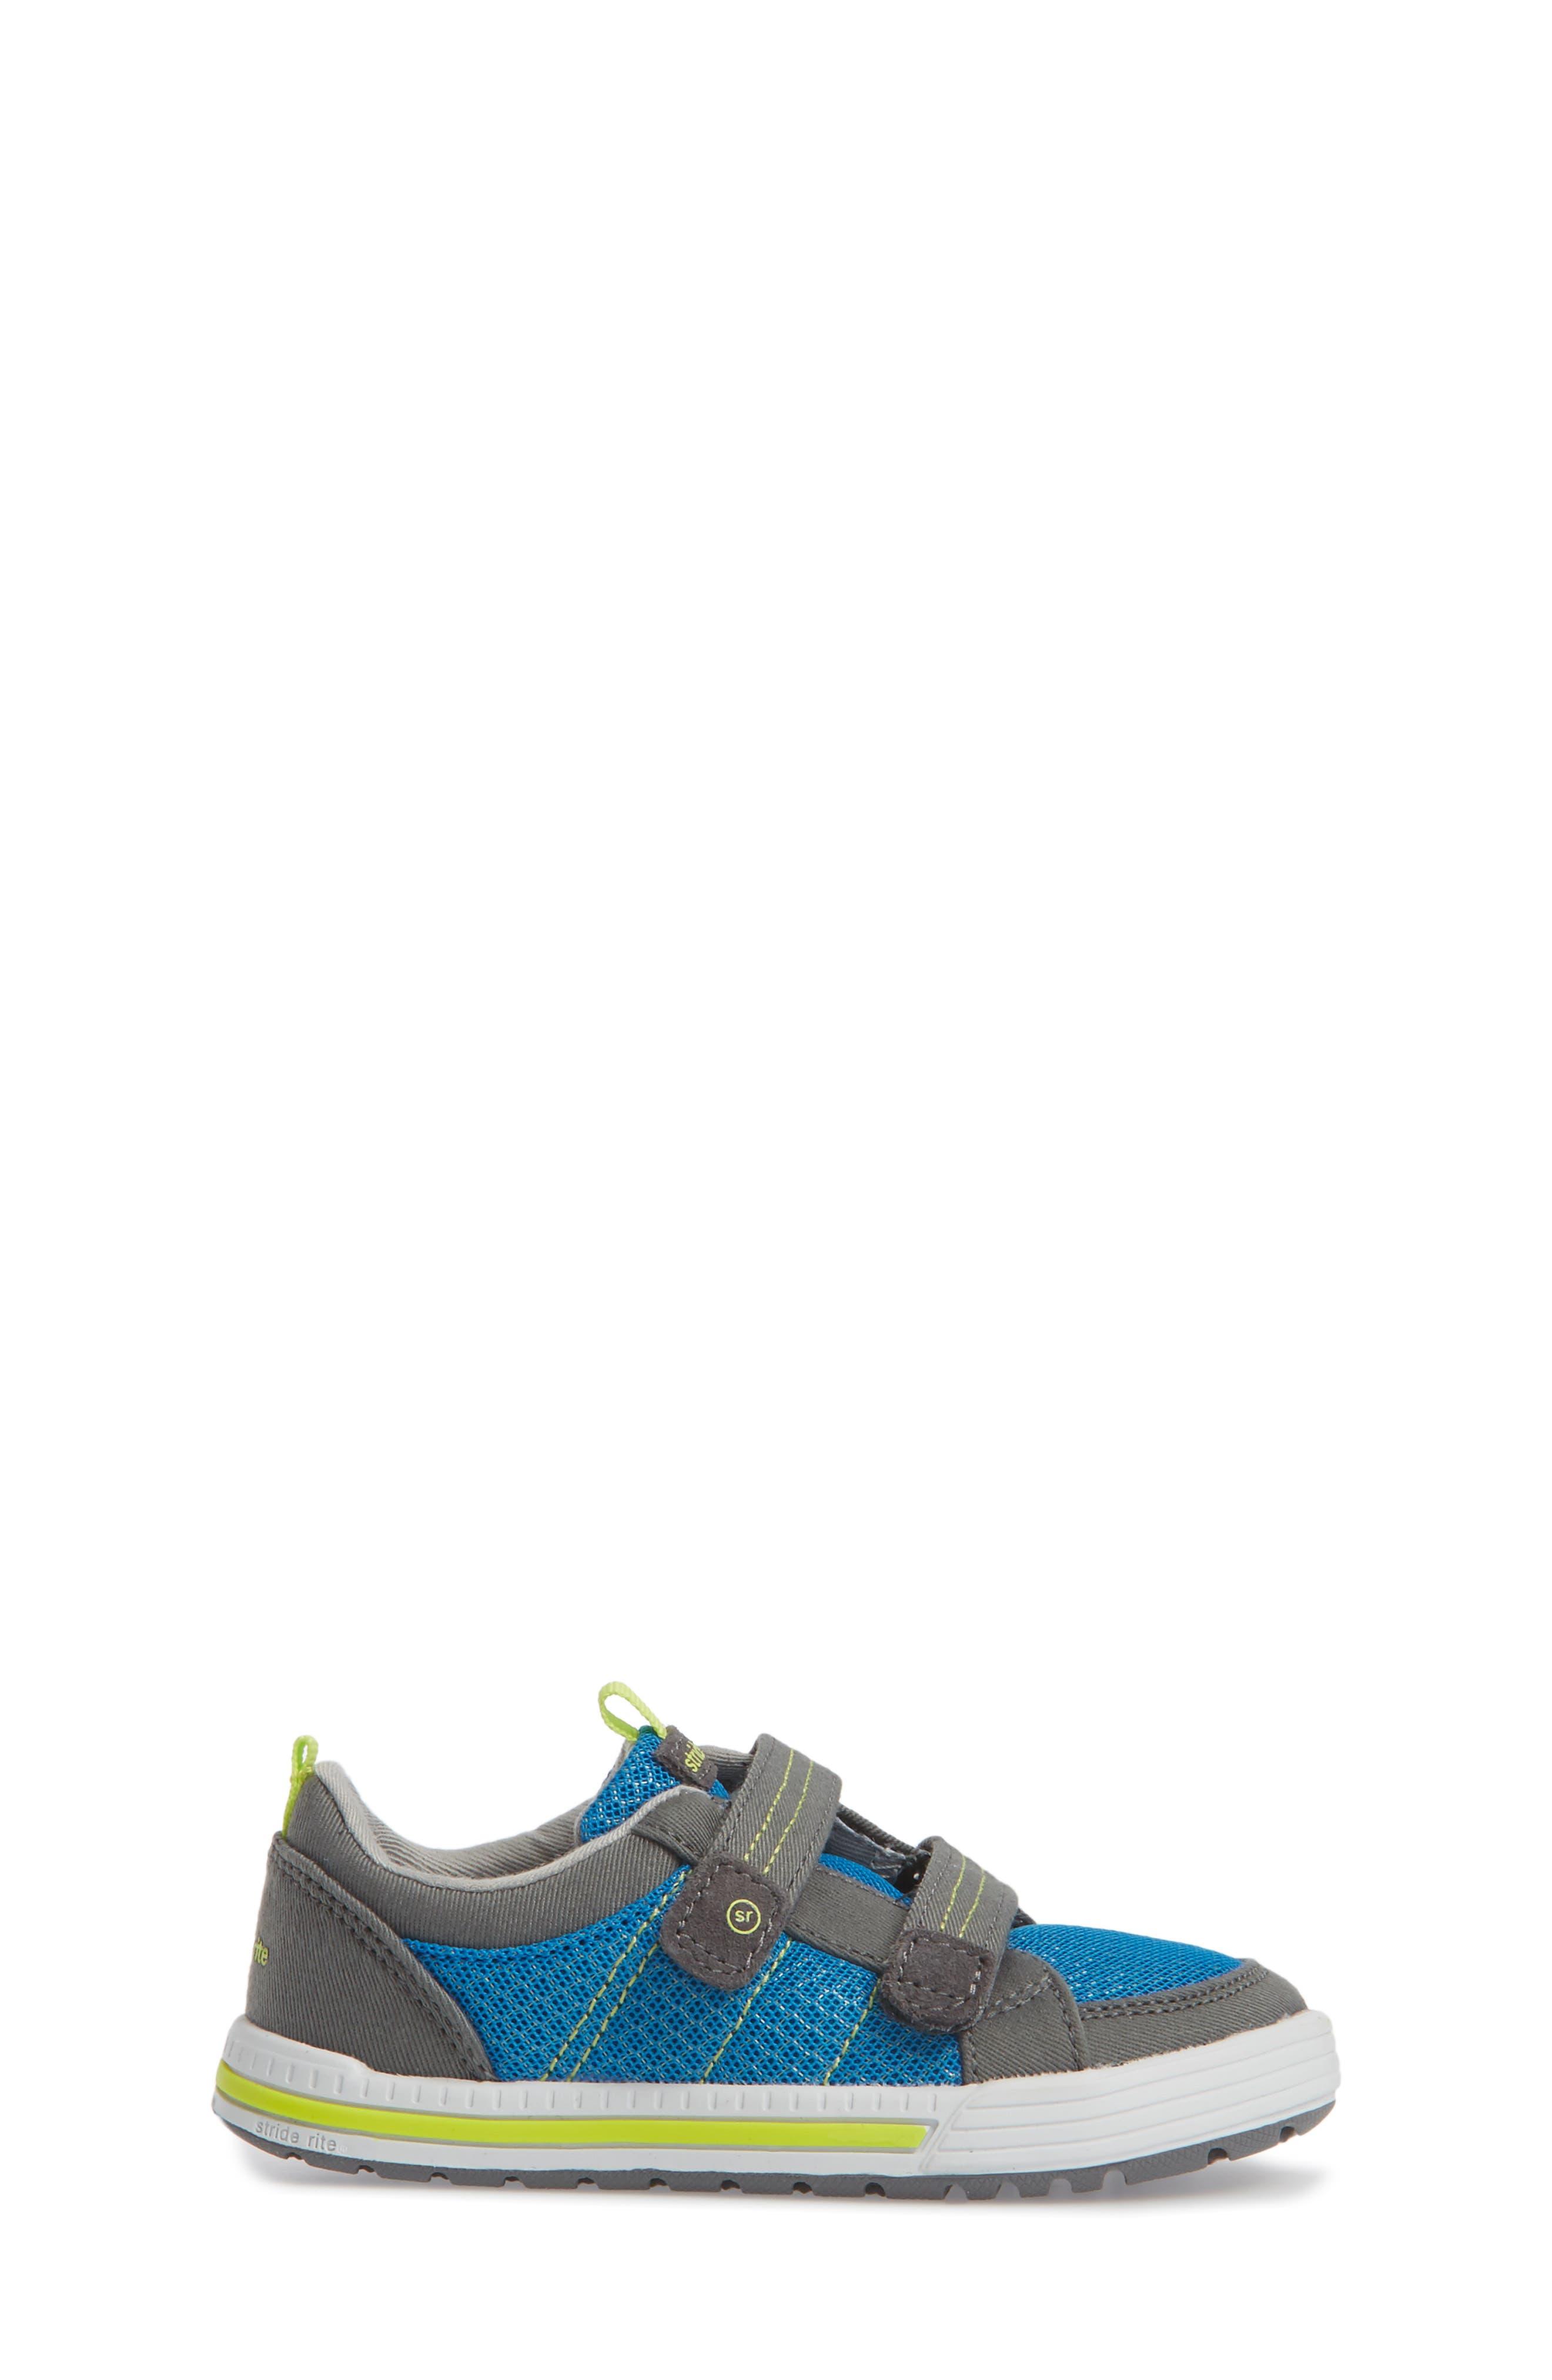 Logan Sneaker,                             Alternate thumbnail 3, color,                             Blue/ Grey